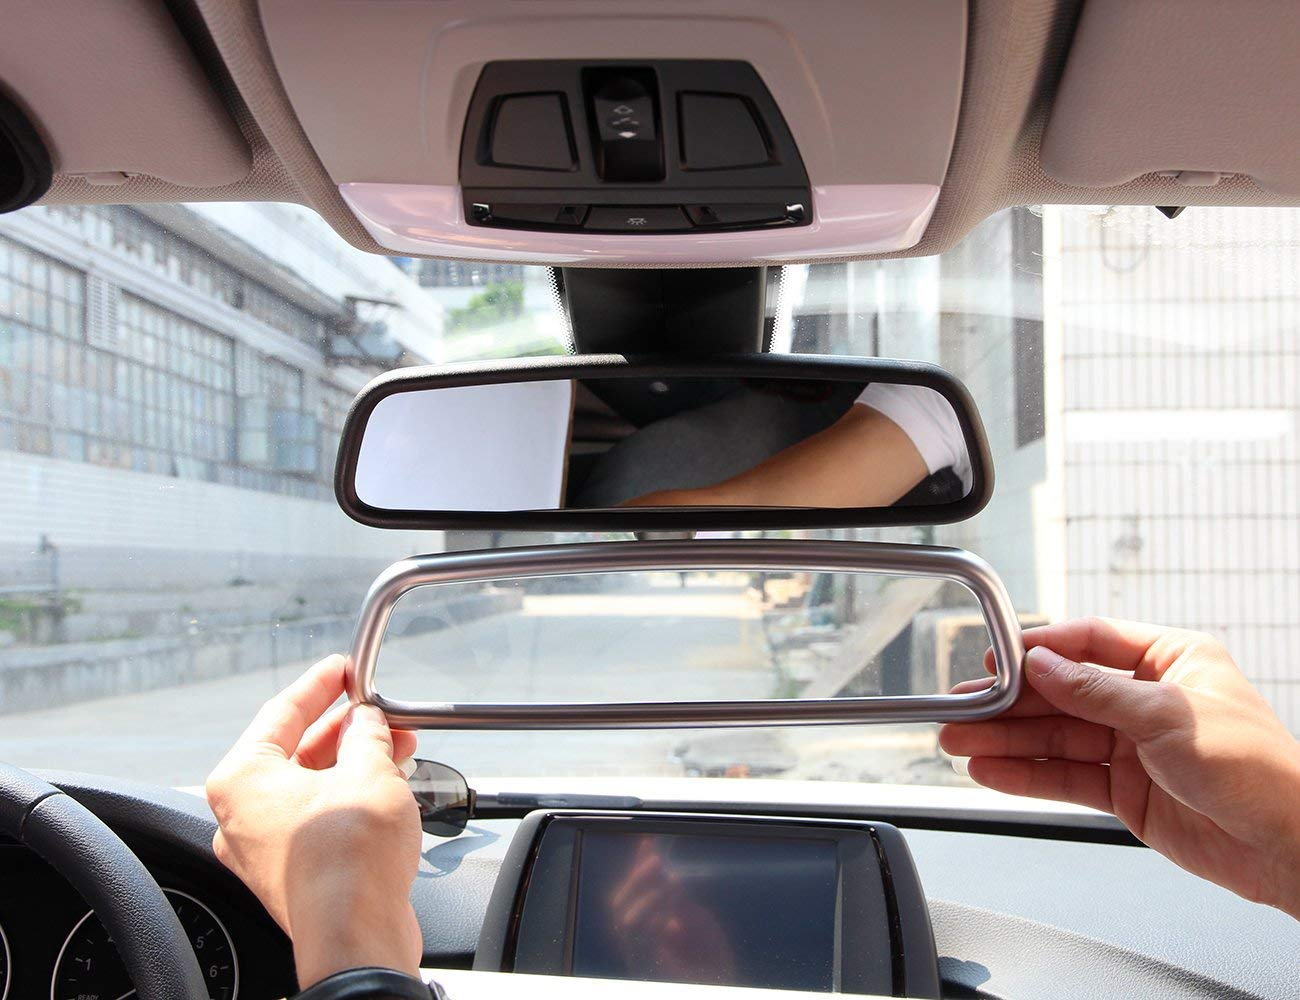 Cromado AUTO Pro para Land Rover//BMW//Jaguar//Mercedes-Benz Cubierta de Espejo retrovisor Interior Accesorios para Interior de Coche ABS